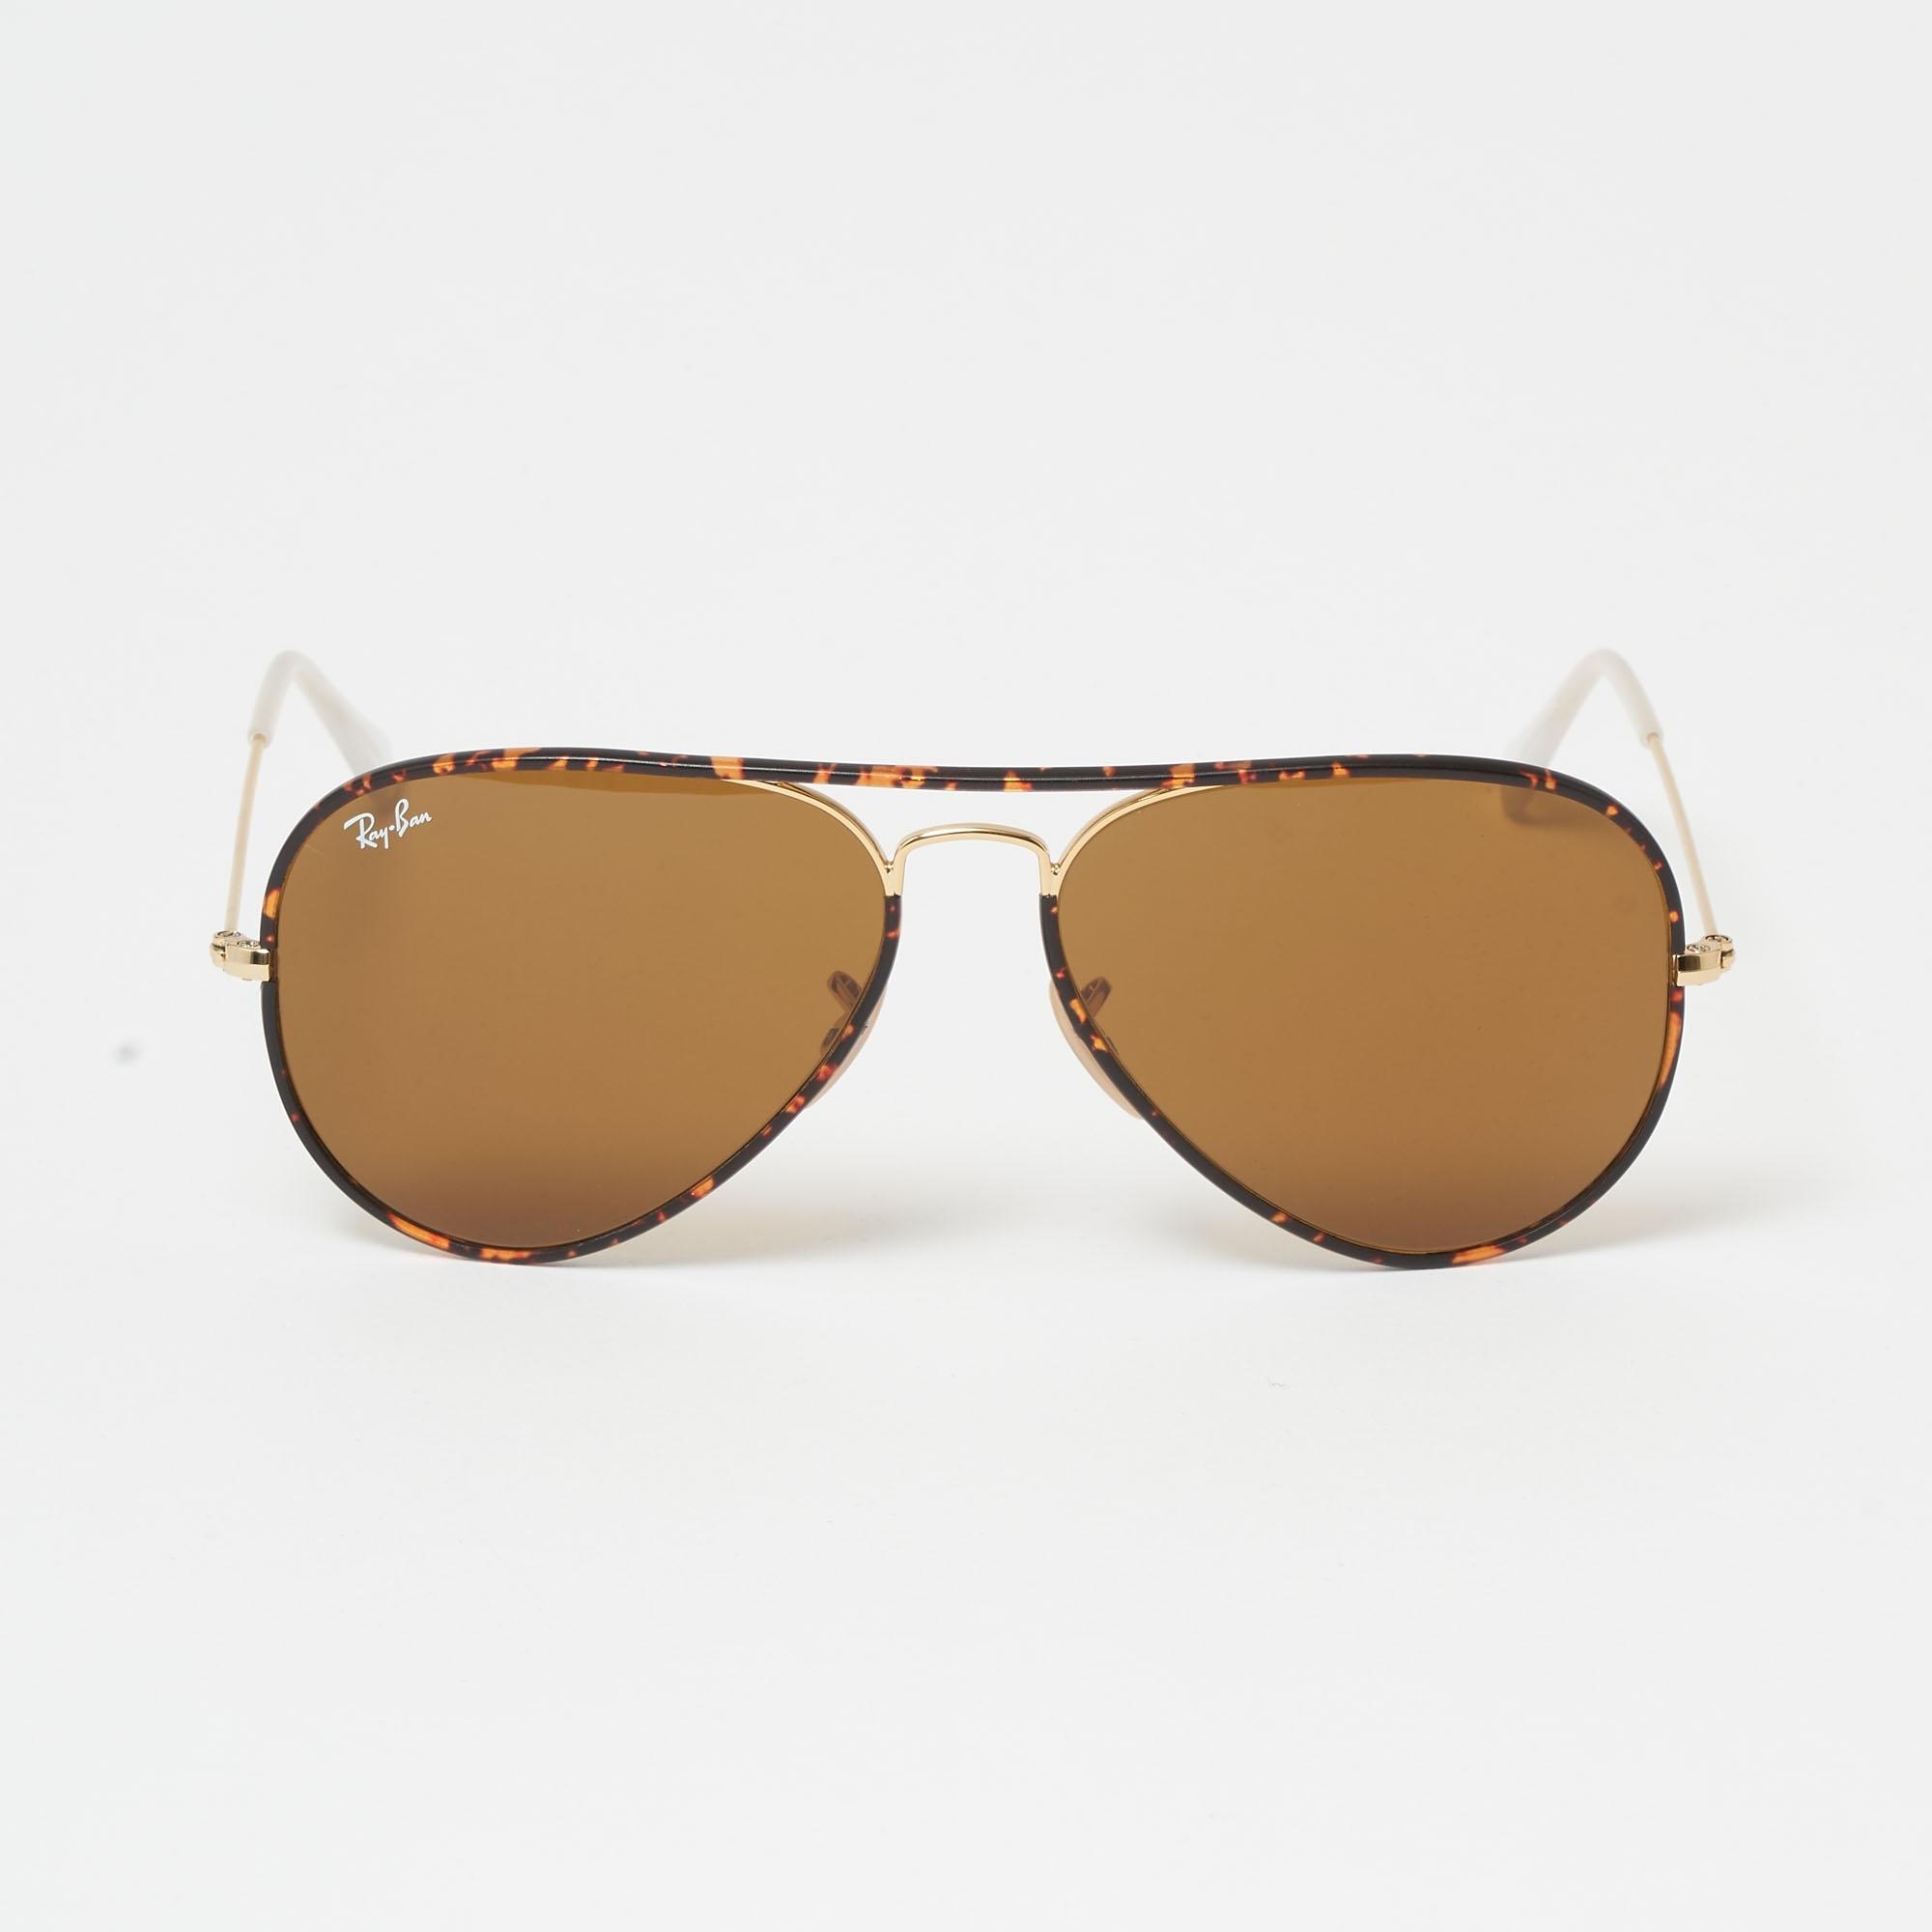 ce4199c562a39 Tortoise Aviator Full Colour Sunglasses - Brown Classic B-15 Lenses